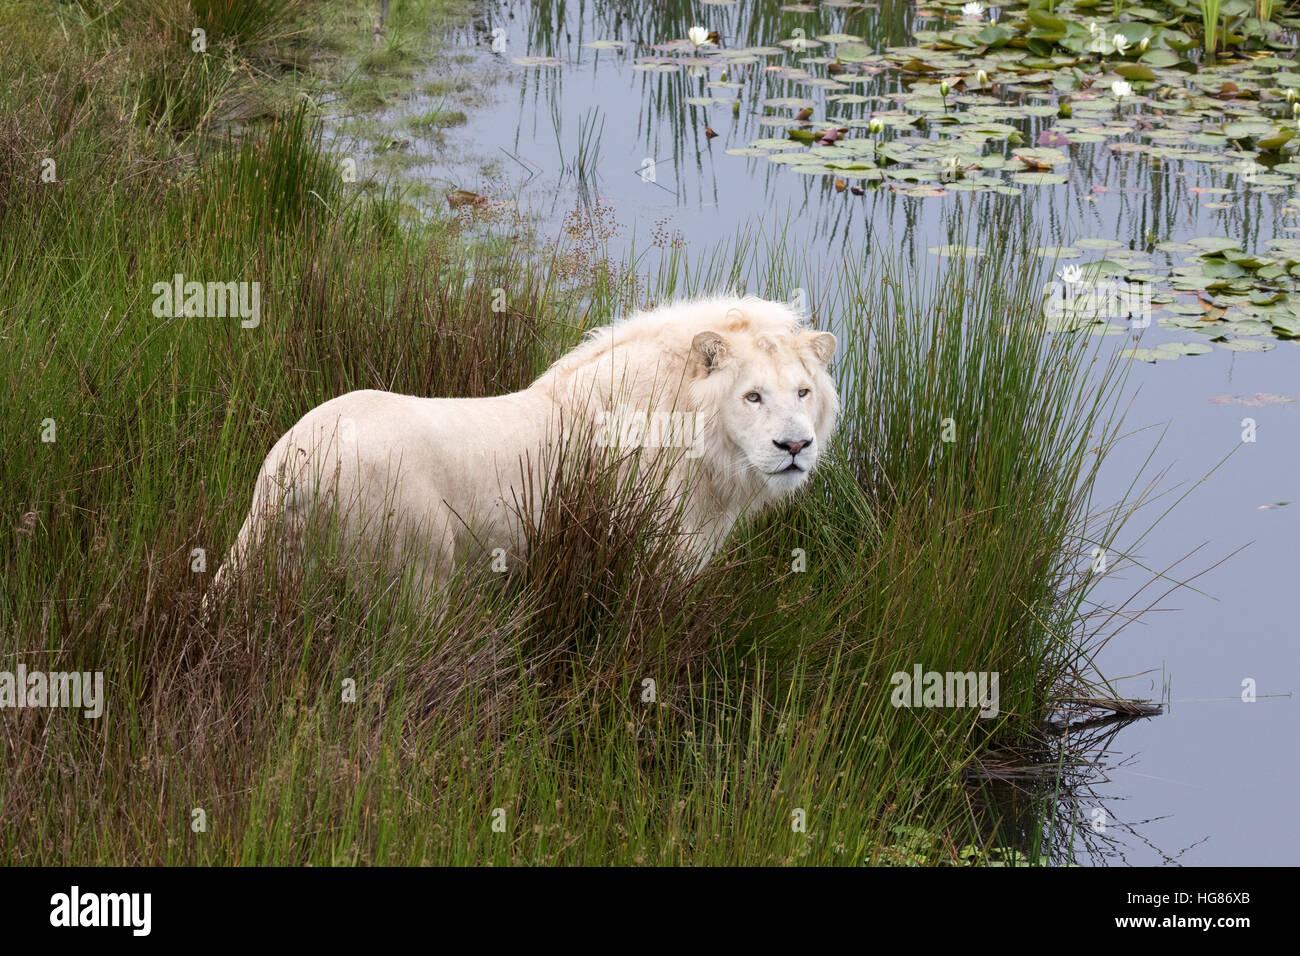 Macho adulto White Lion ( Panthera leo krugeri ), Tenikwa Wildlife Center de sensibilización, Sudáfrica Imagen De Stock